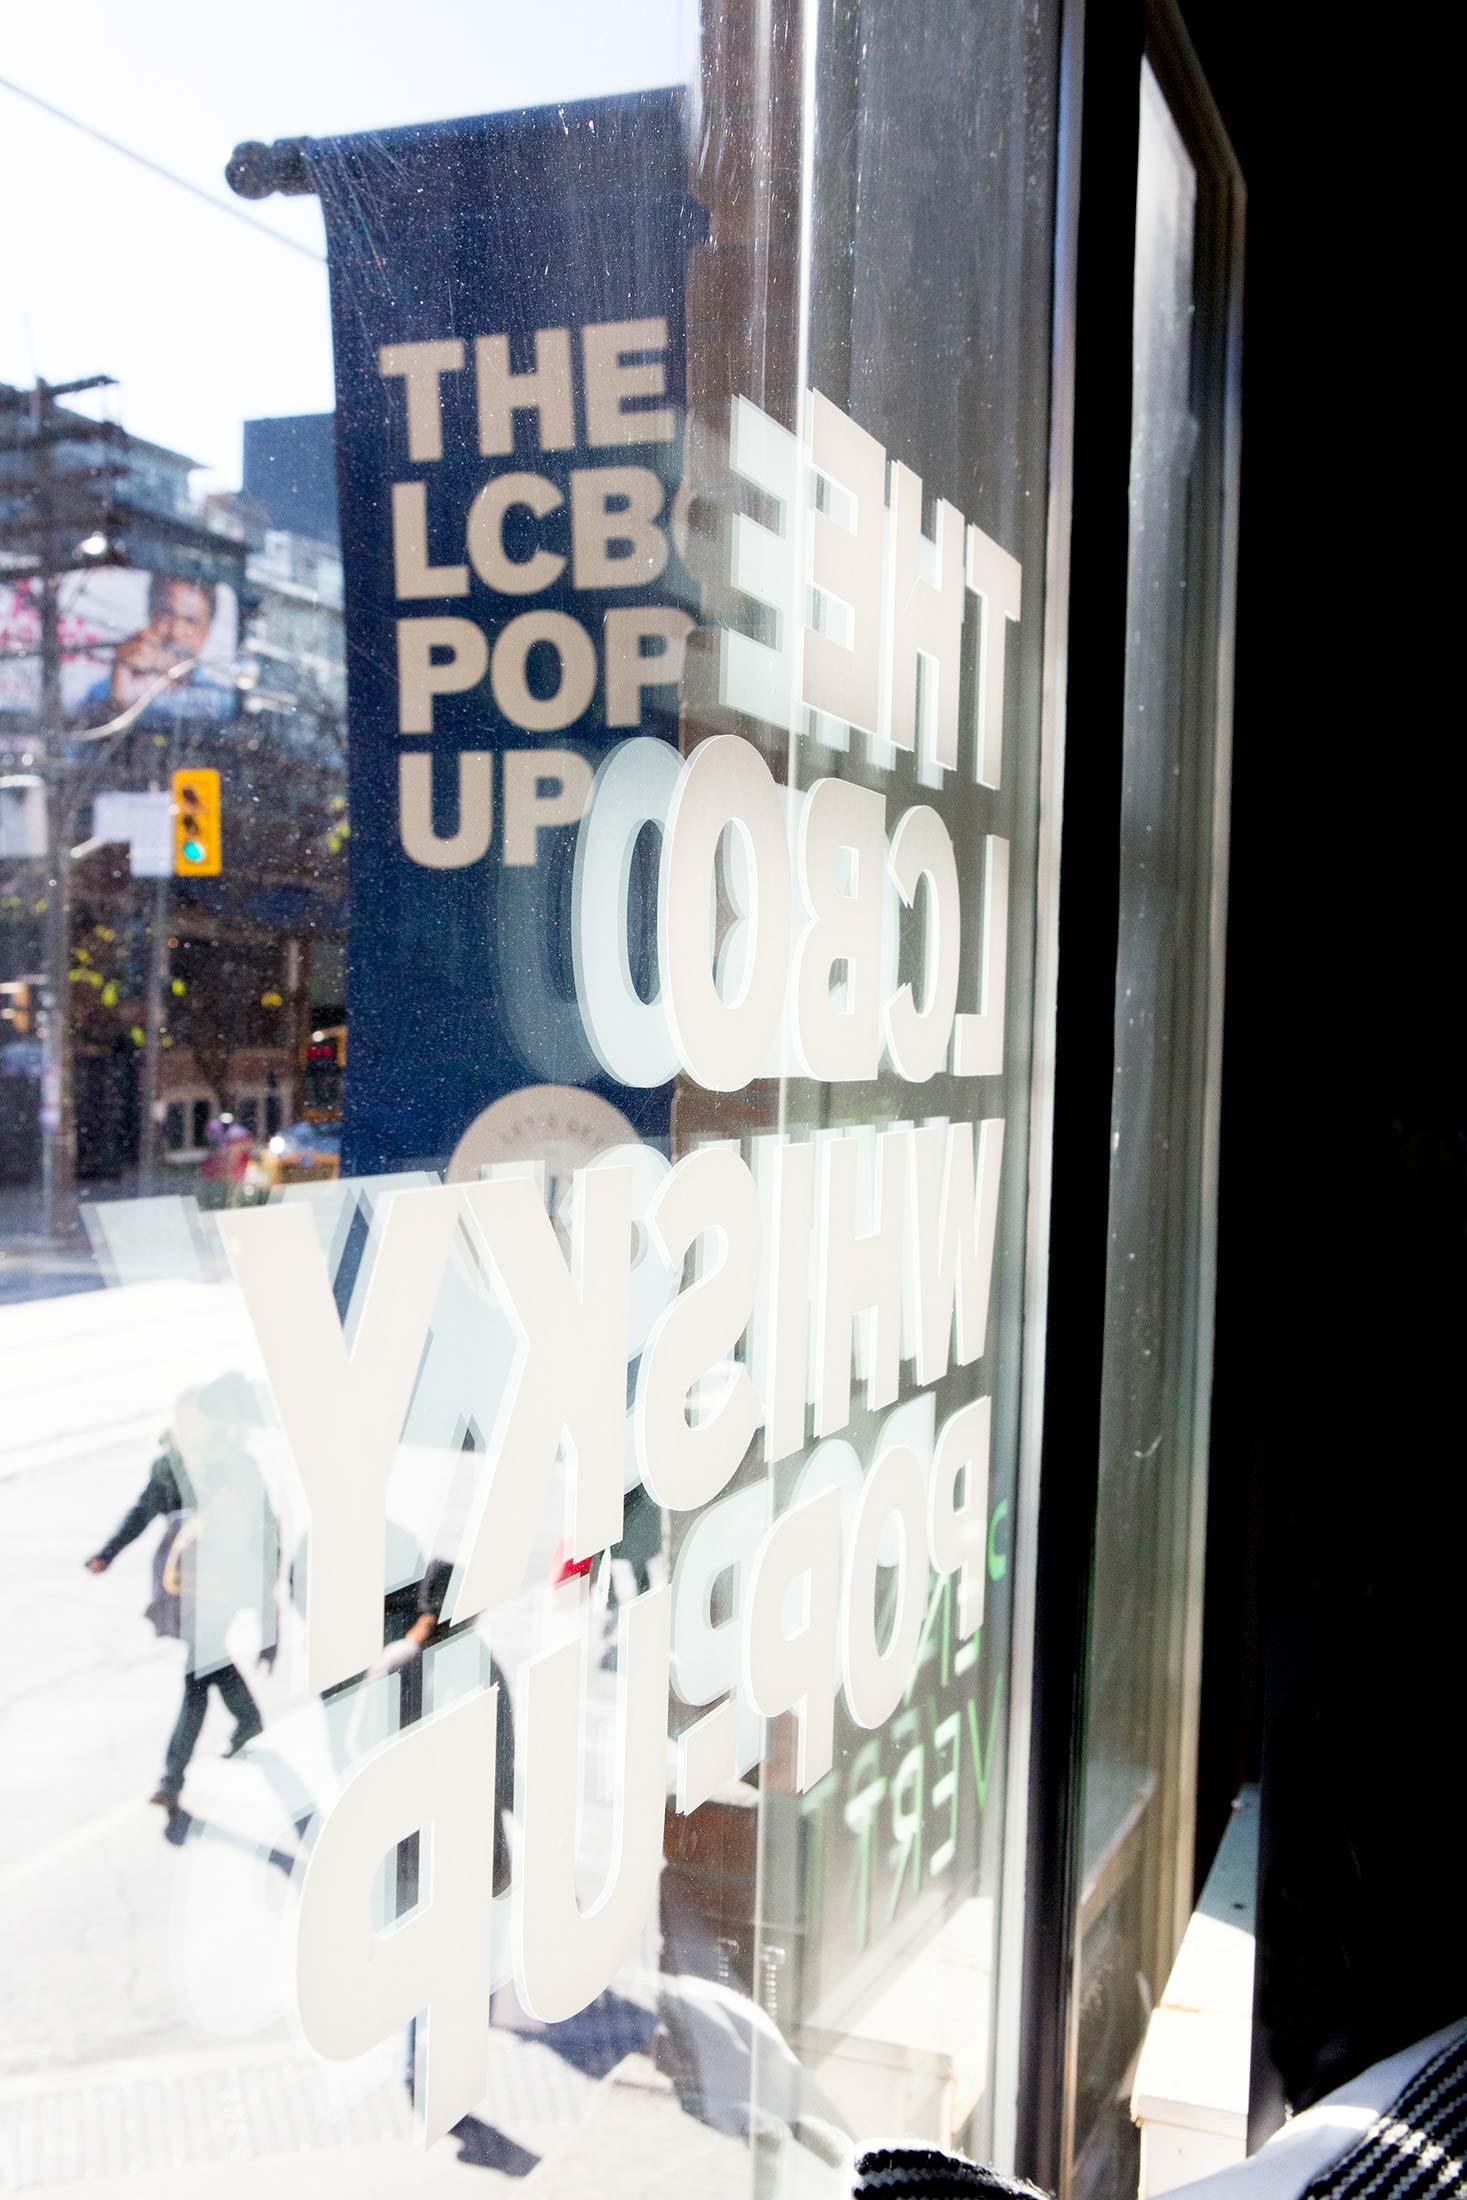 LCBO-whisky-pop-up-signage-Toronto-Sputnik-Design-Partners.jpg